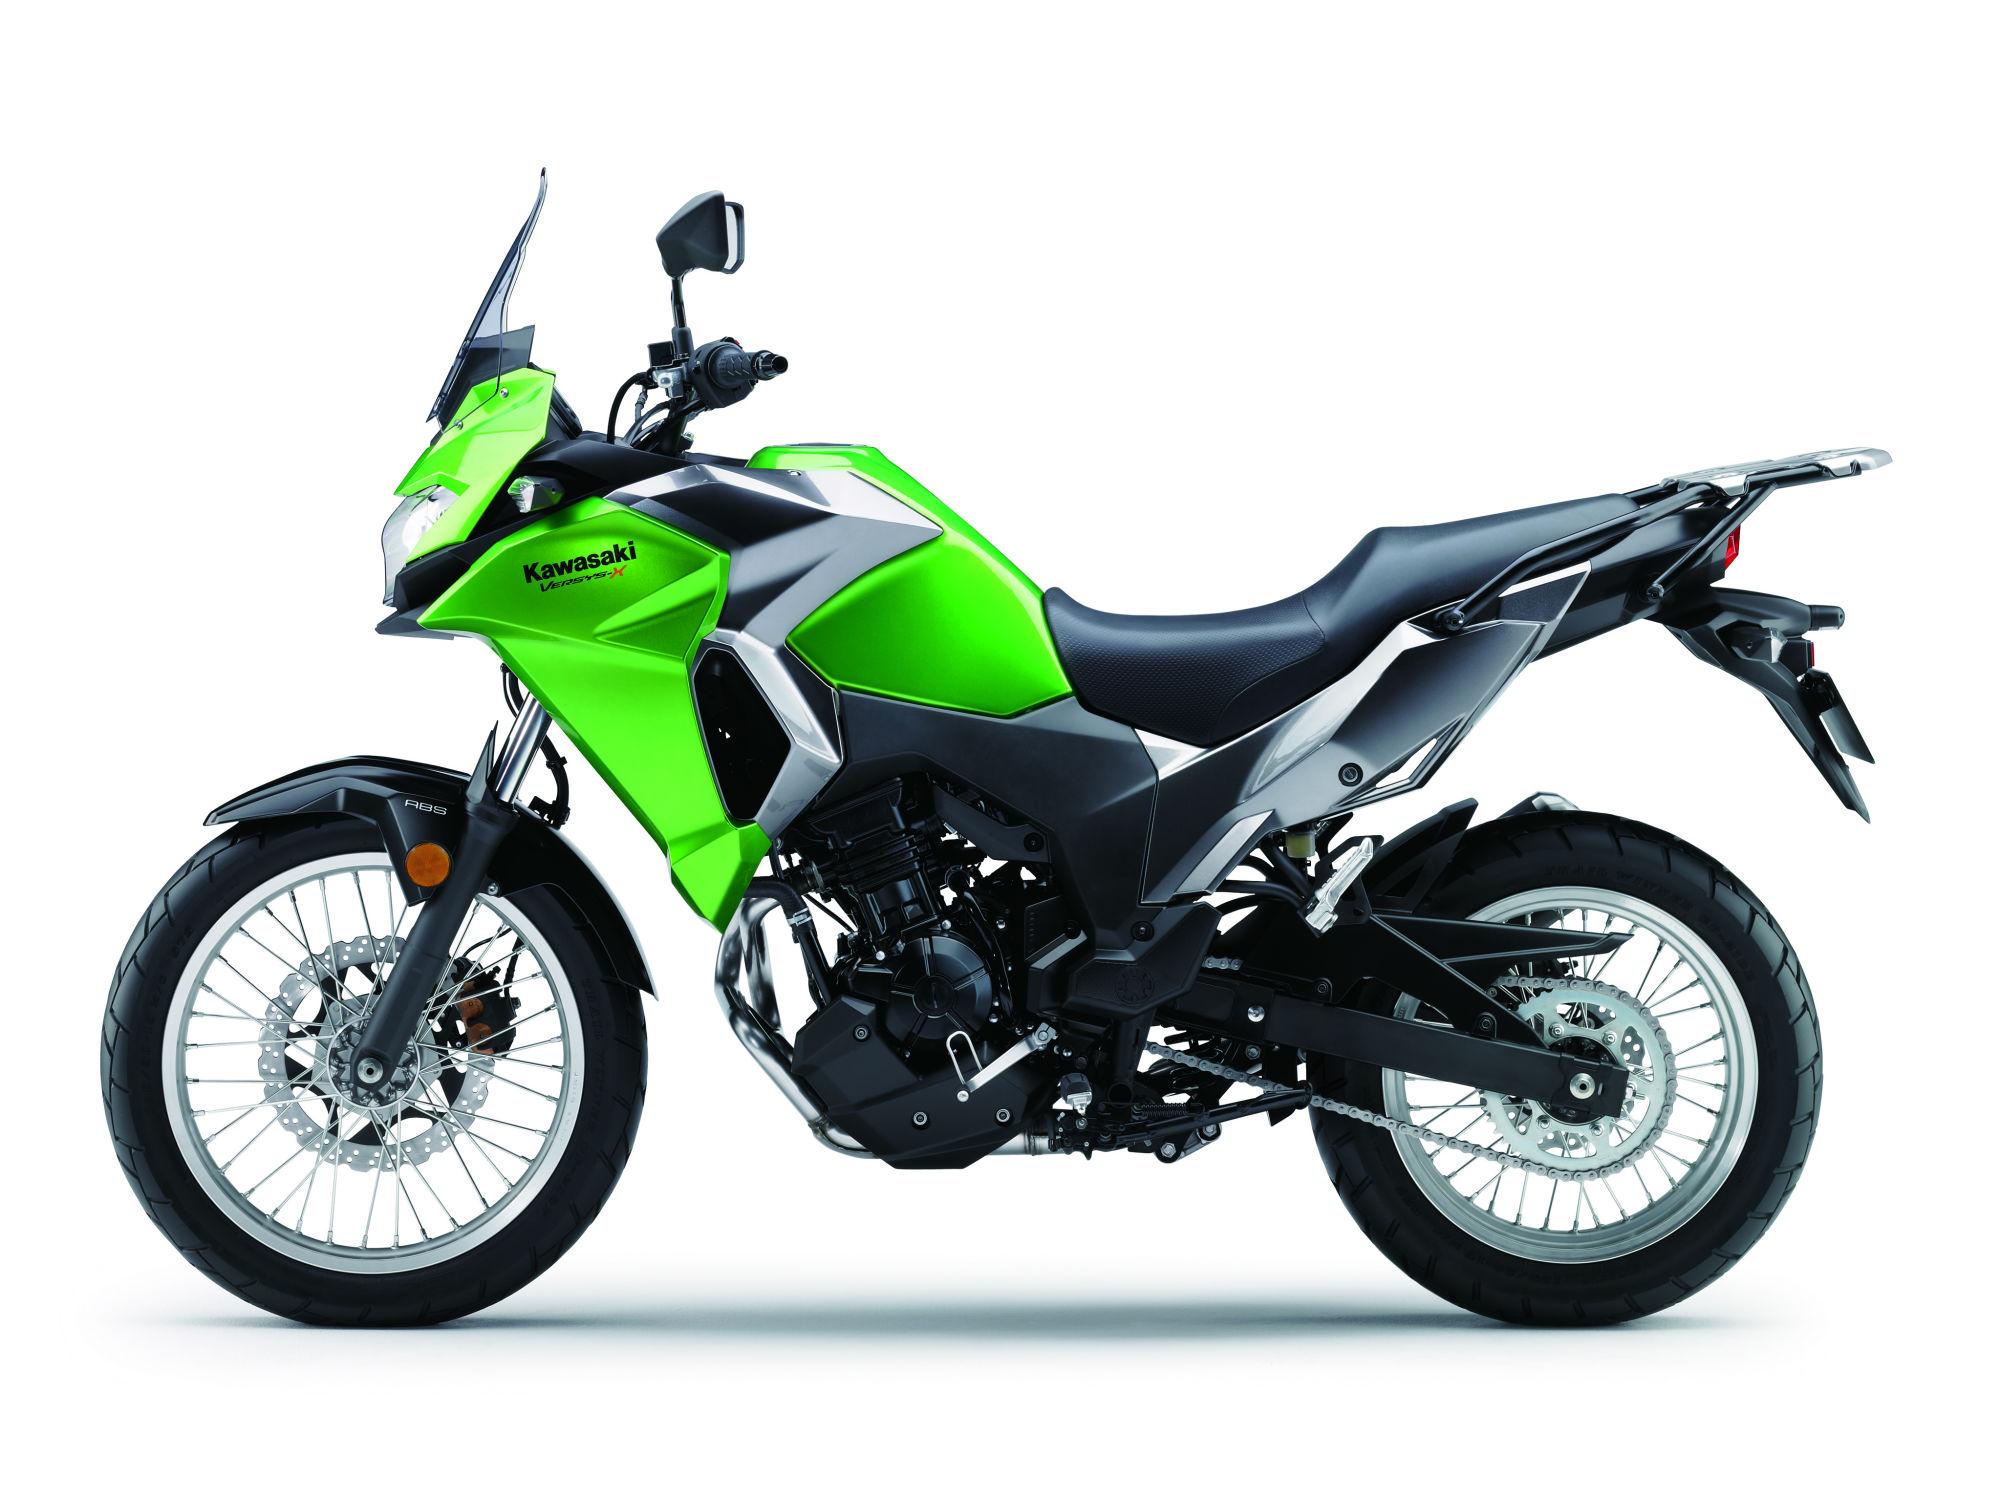 New Kawasaki Versys-X 300 | Visordown